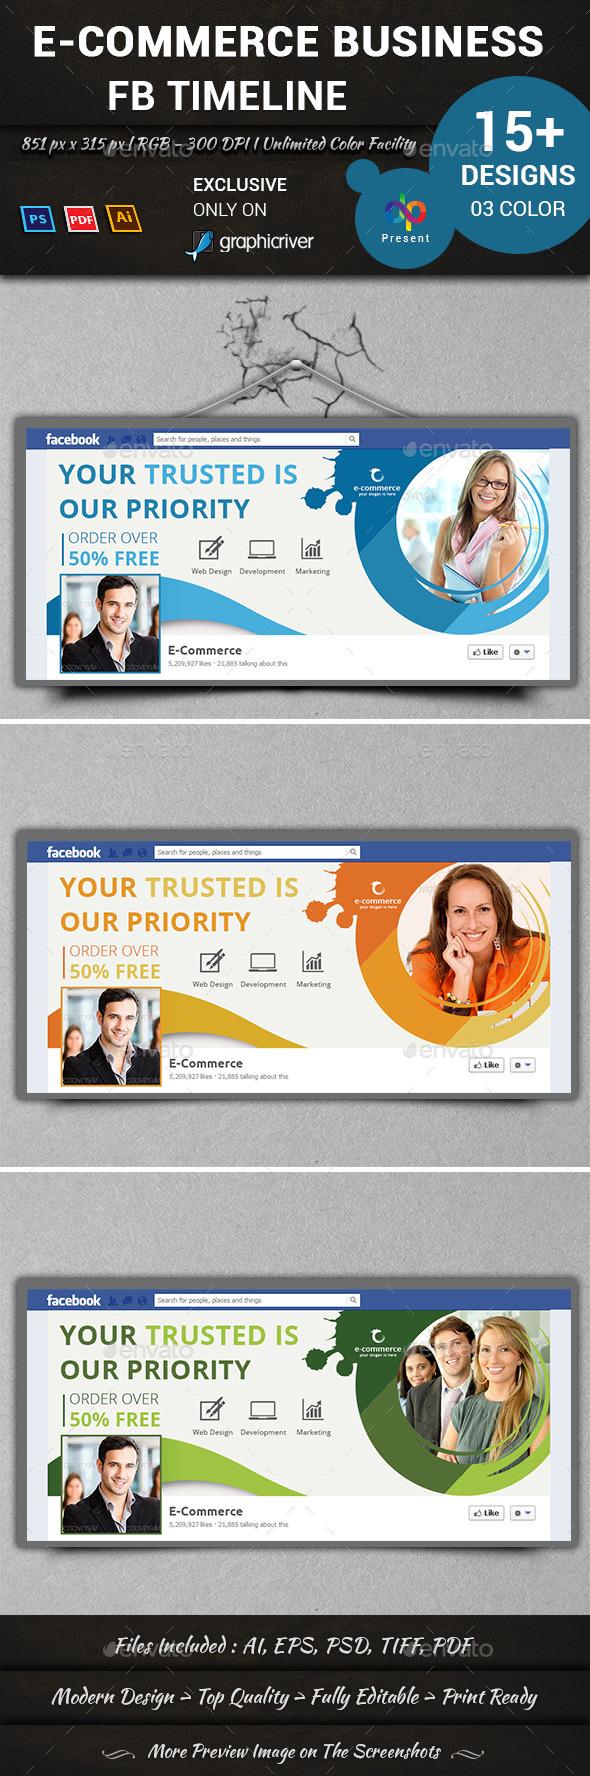 GraphicRiver E-Commerce Business FB Timeline 10748524